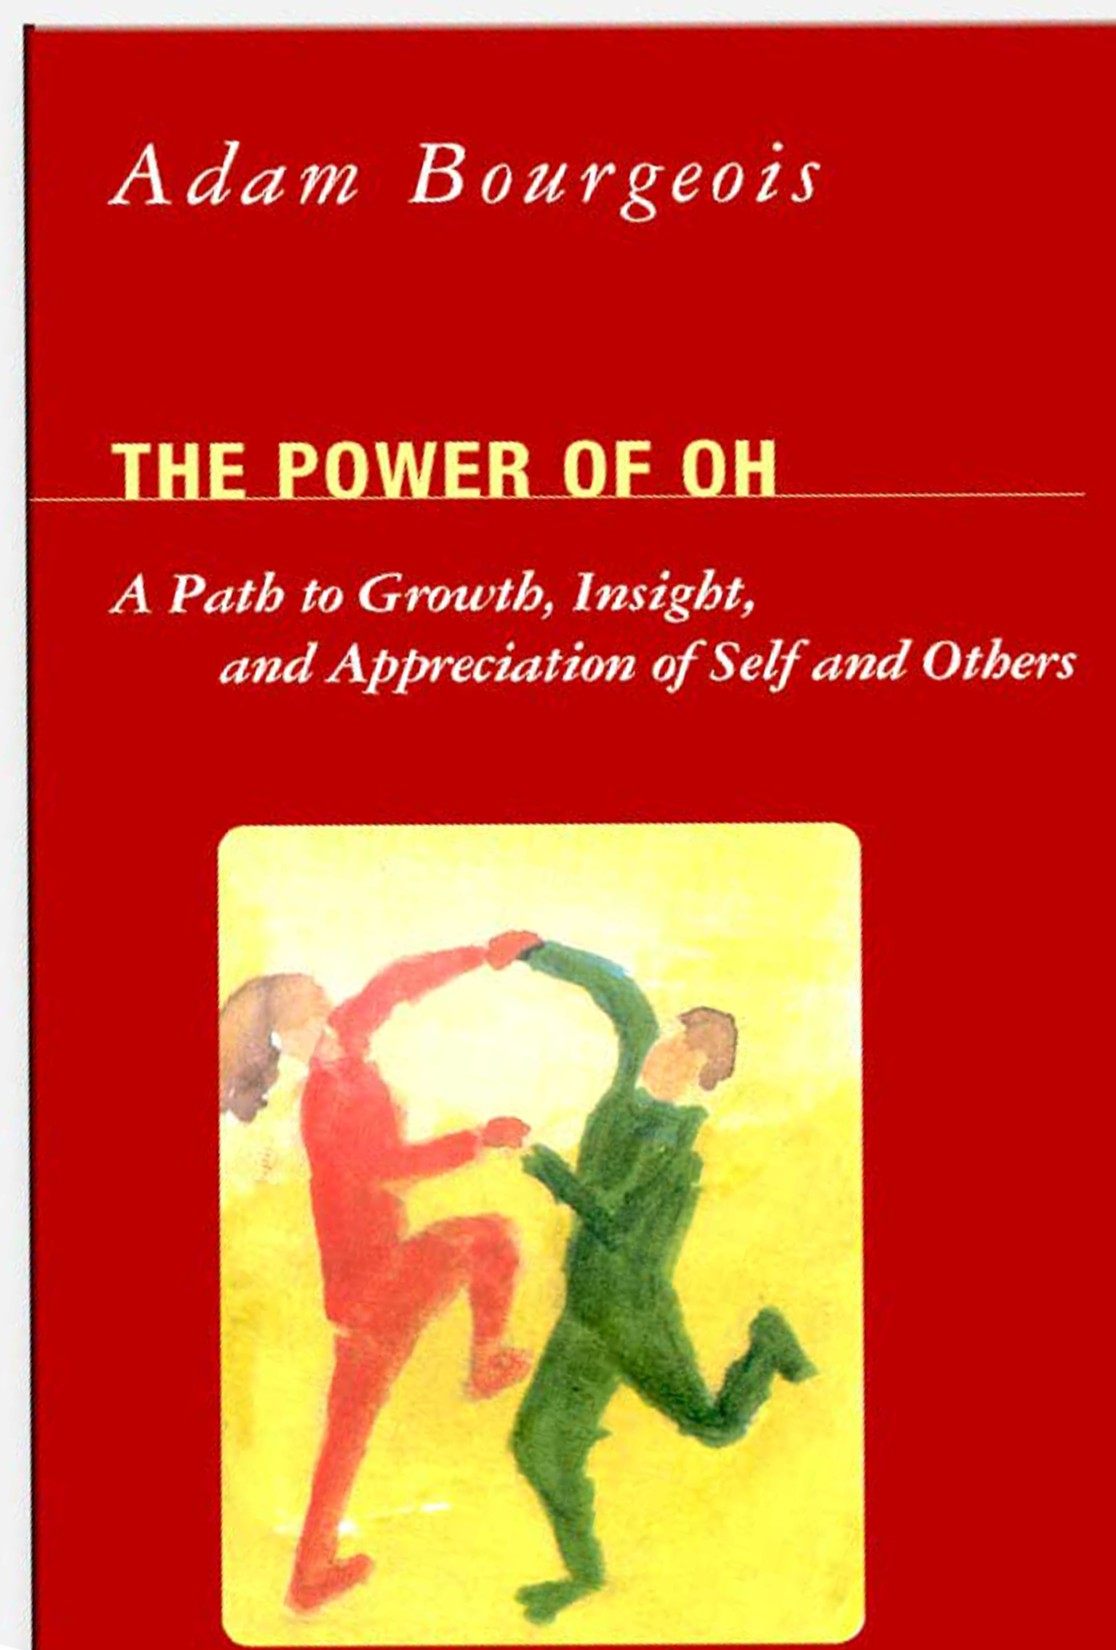 The Power of OH – Η ΔΥΝΑΜΗ ΤΩΝ ΟΗ